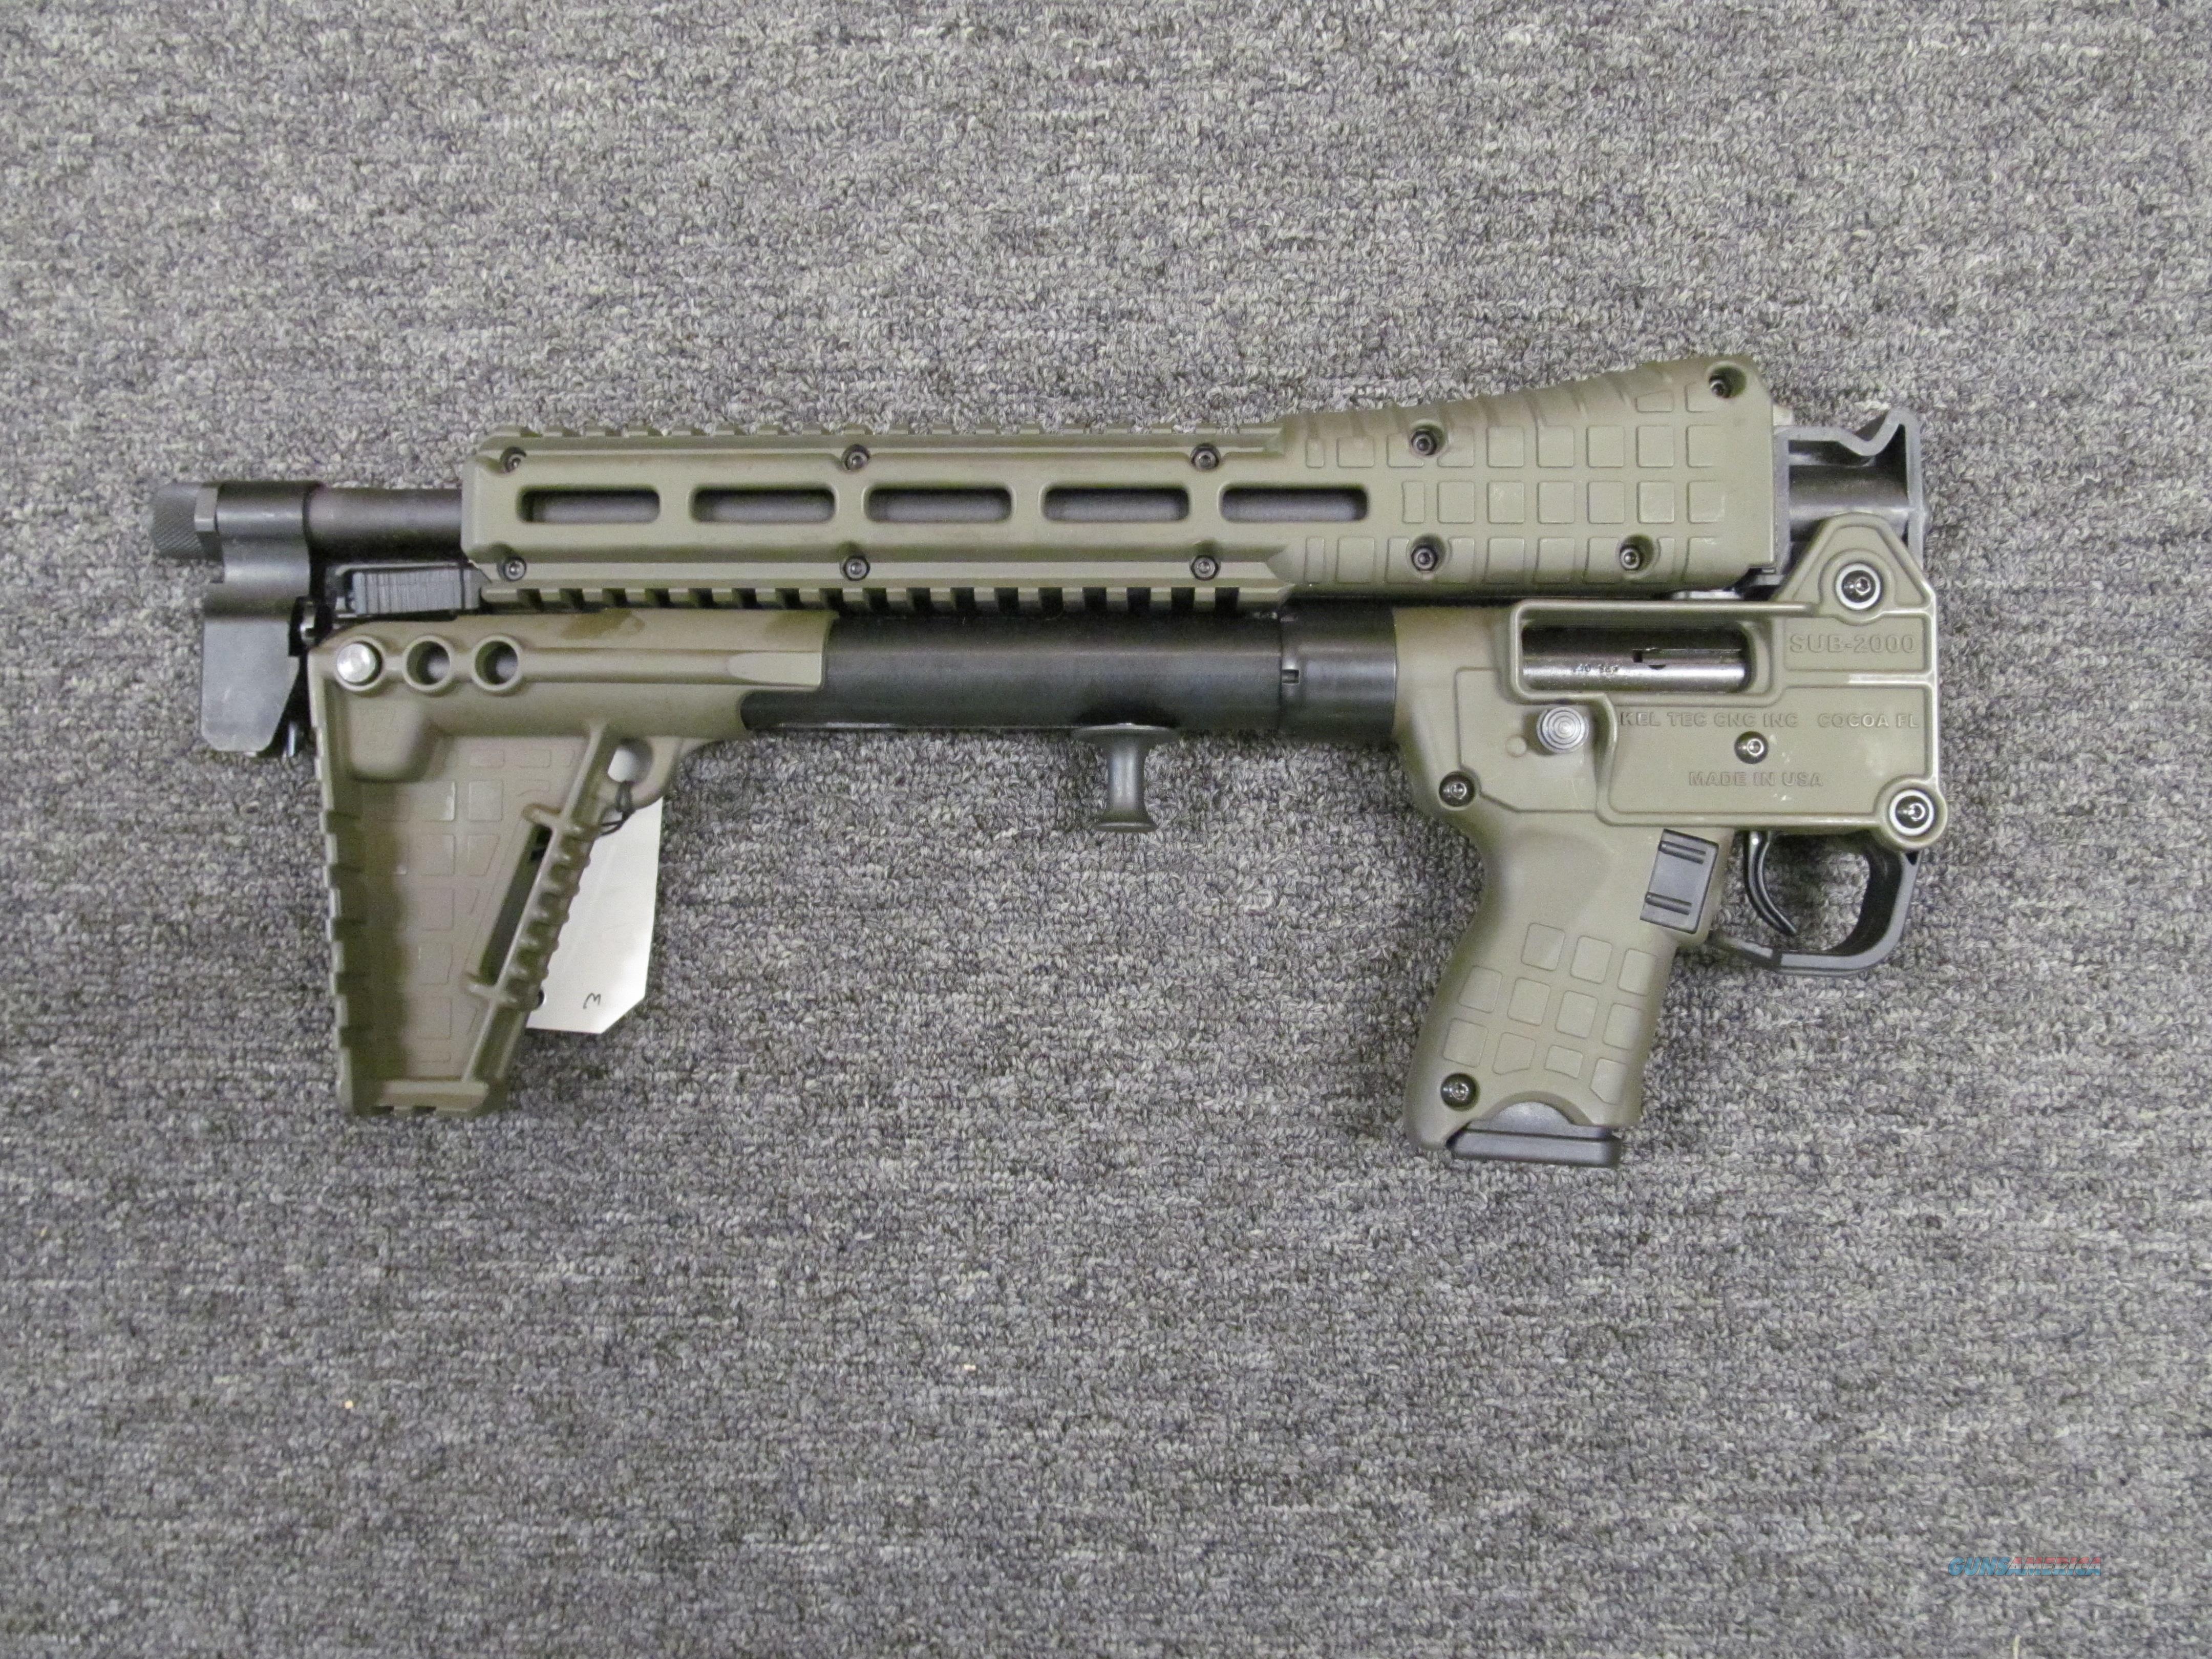 Kel-Tec Sub-2000 Gen 2 (SUB-2K40-GLK23)  Guns > Rifles > Kel-Tec Rifles